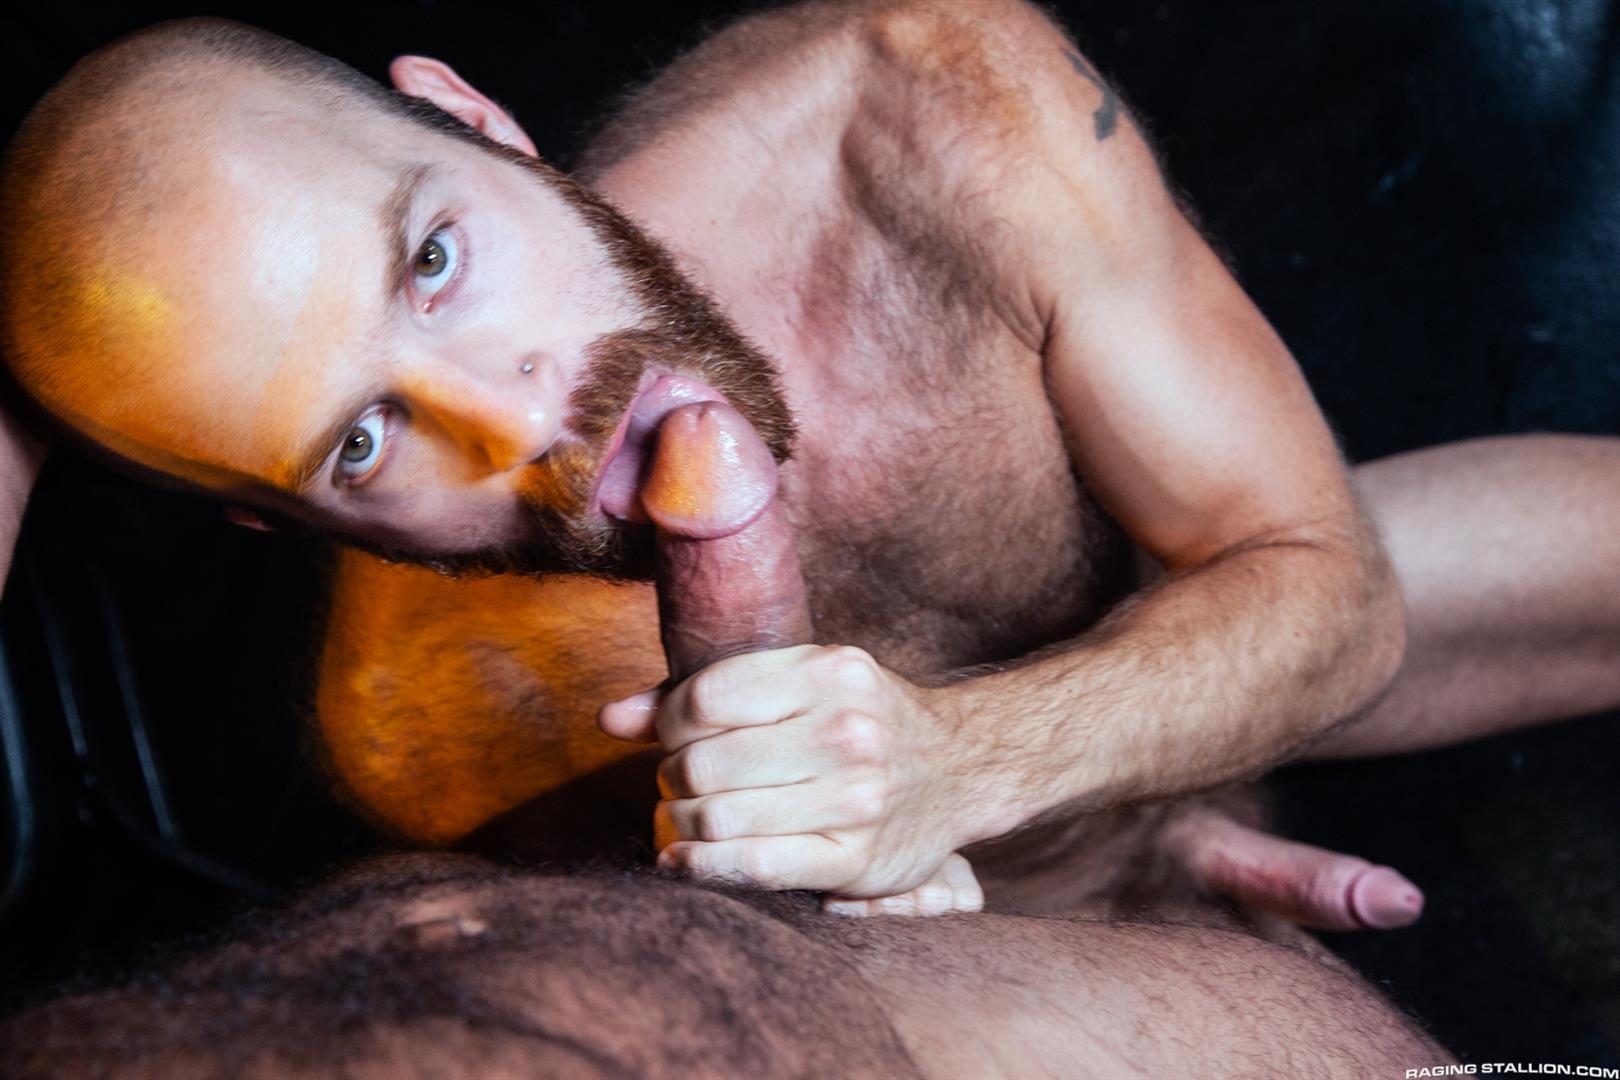 Raging-Stallion-Drake-Masters-and-James-Stevens-hairy-guys-cum-facial-13 Hairy Muscle Bear Drake Masters and Otter James Stevens Swap Cum Facials